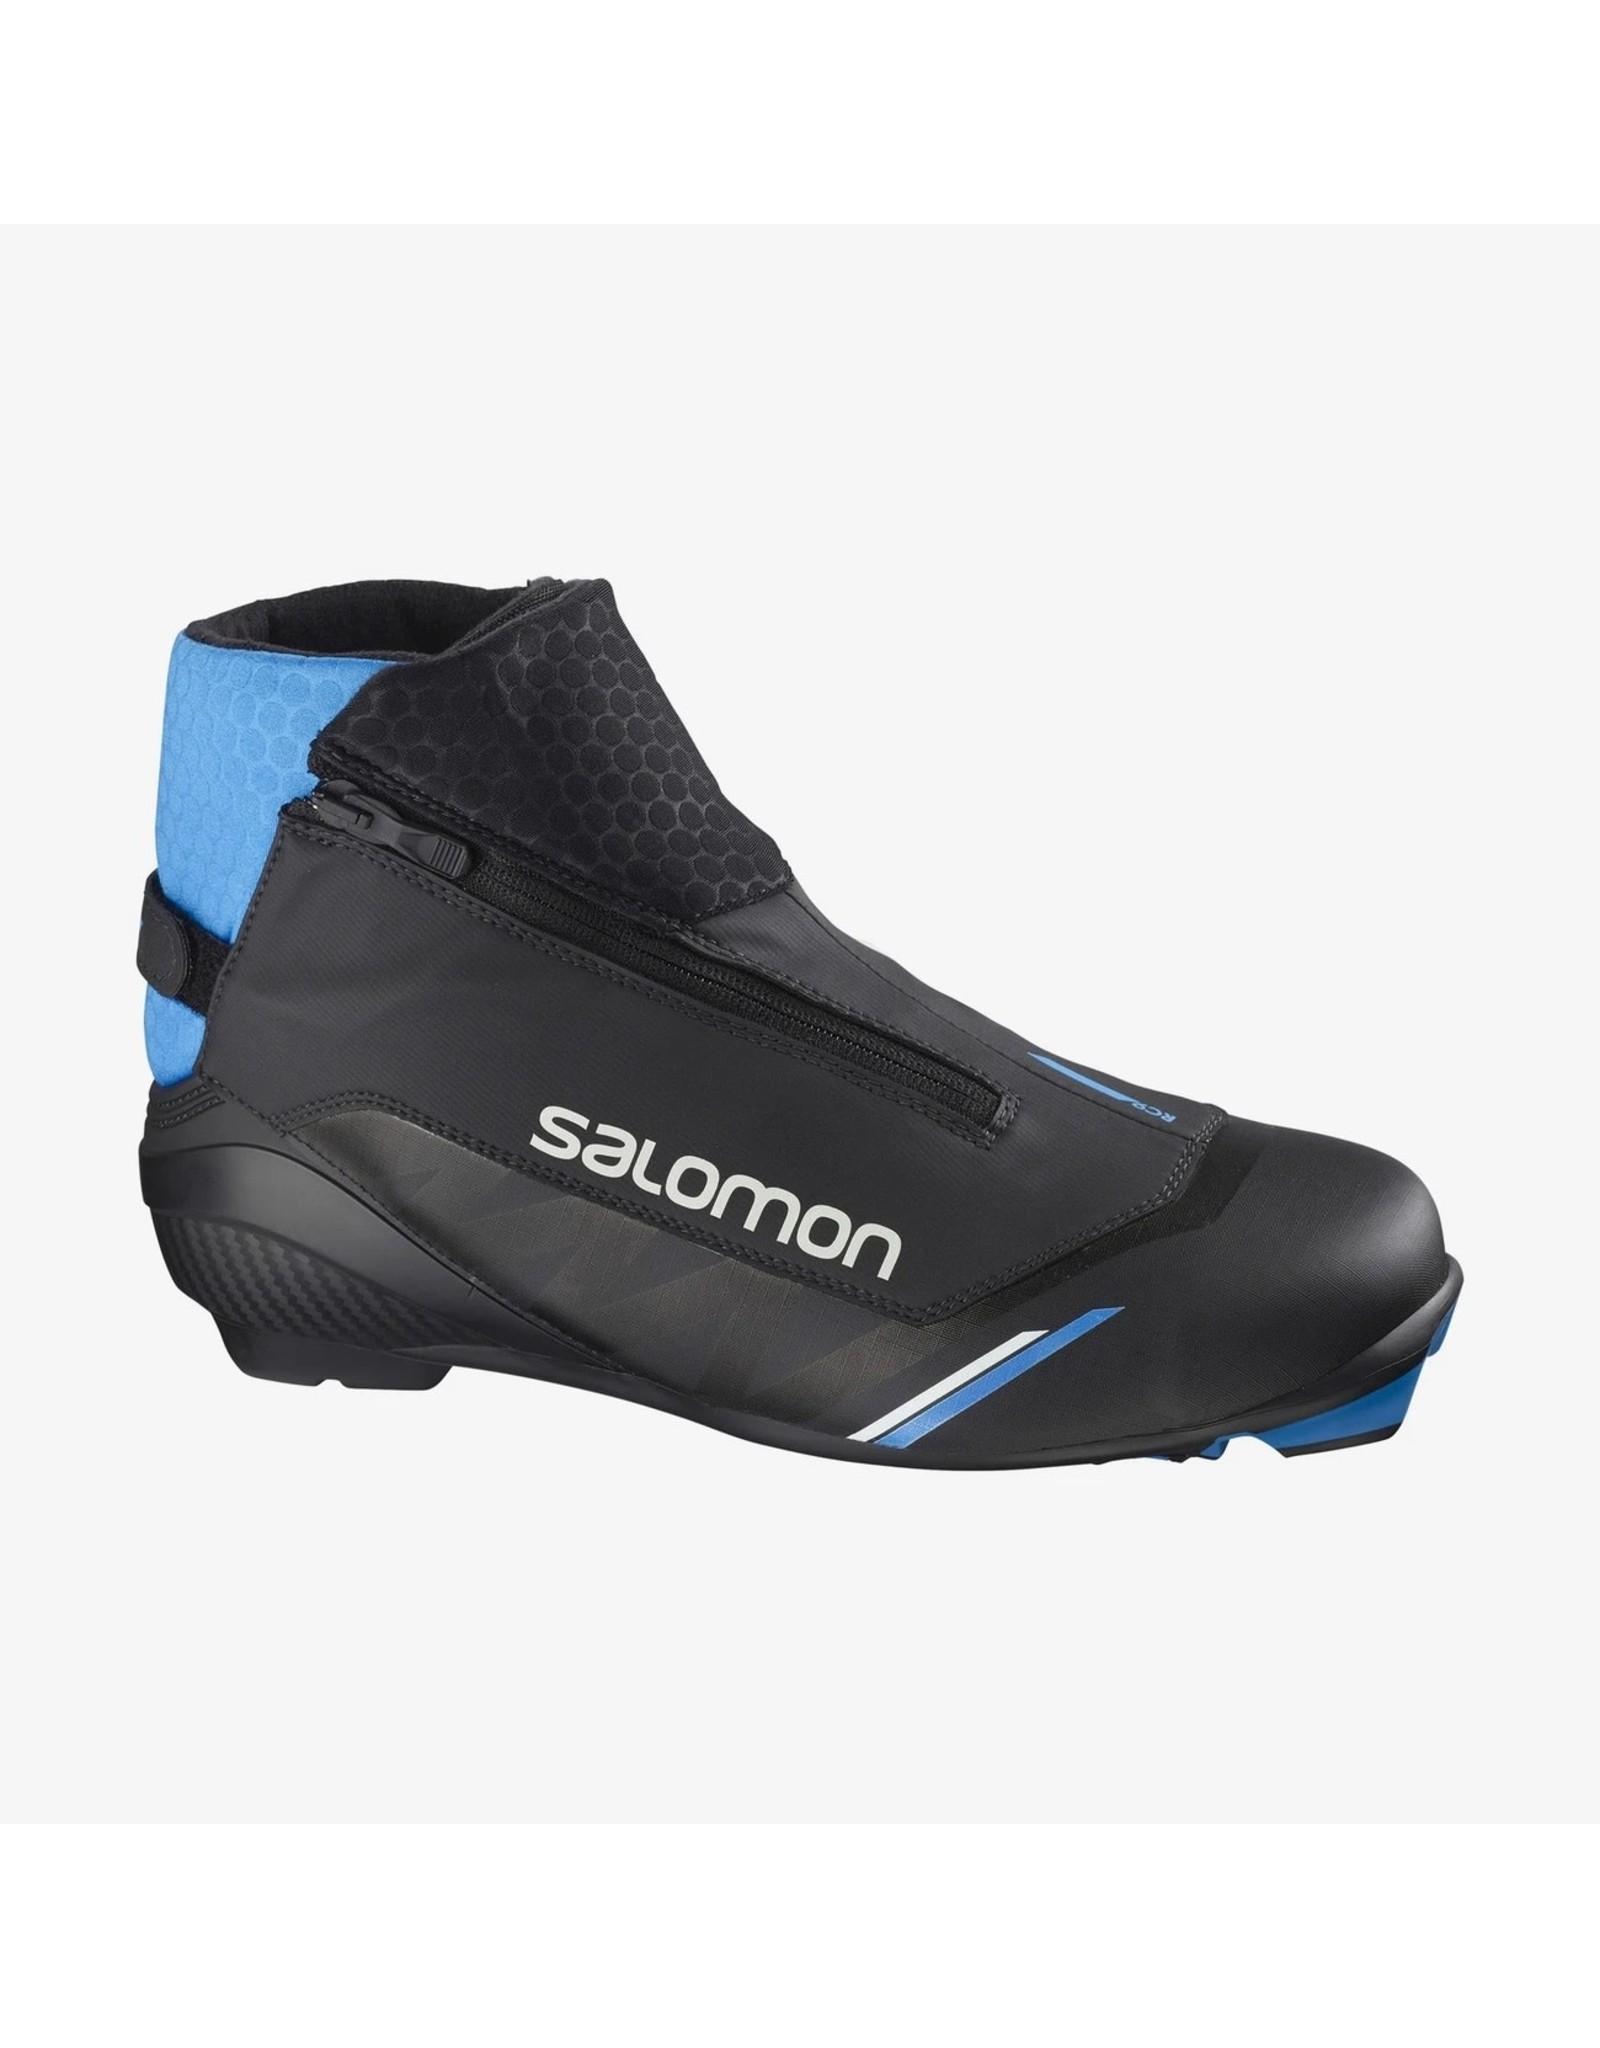 SALOMON '22, SALOMON, Boot, RC9 Nocturne Prolink